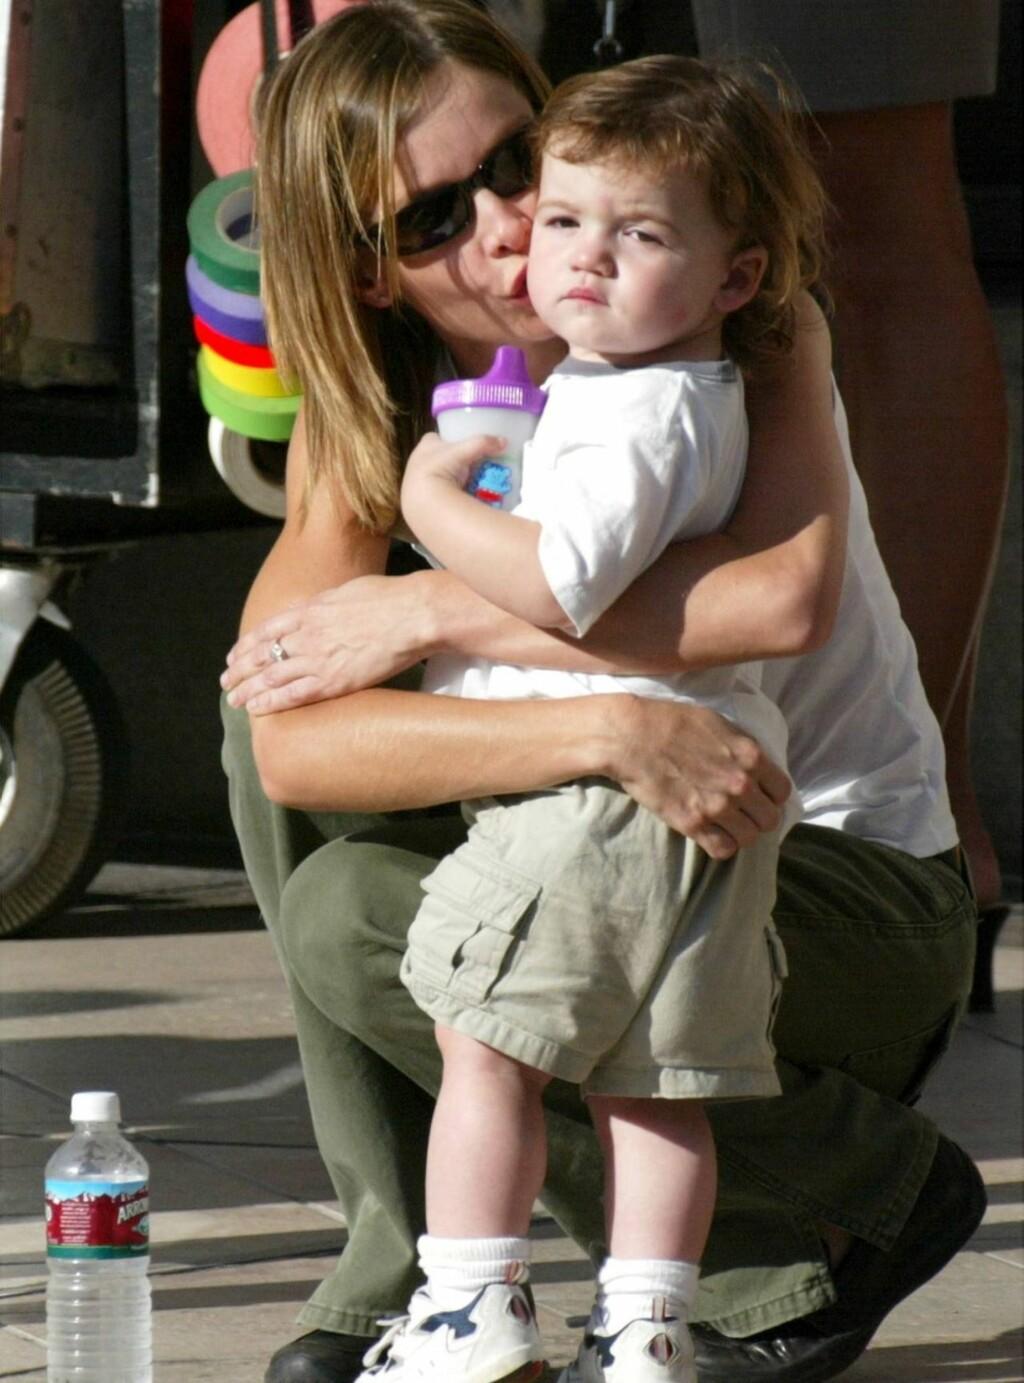 BARNEKJÆR: Calista med adoptivsønnen Liam (5). Får hun flere barn med Harrison? Foto: All Over Press